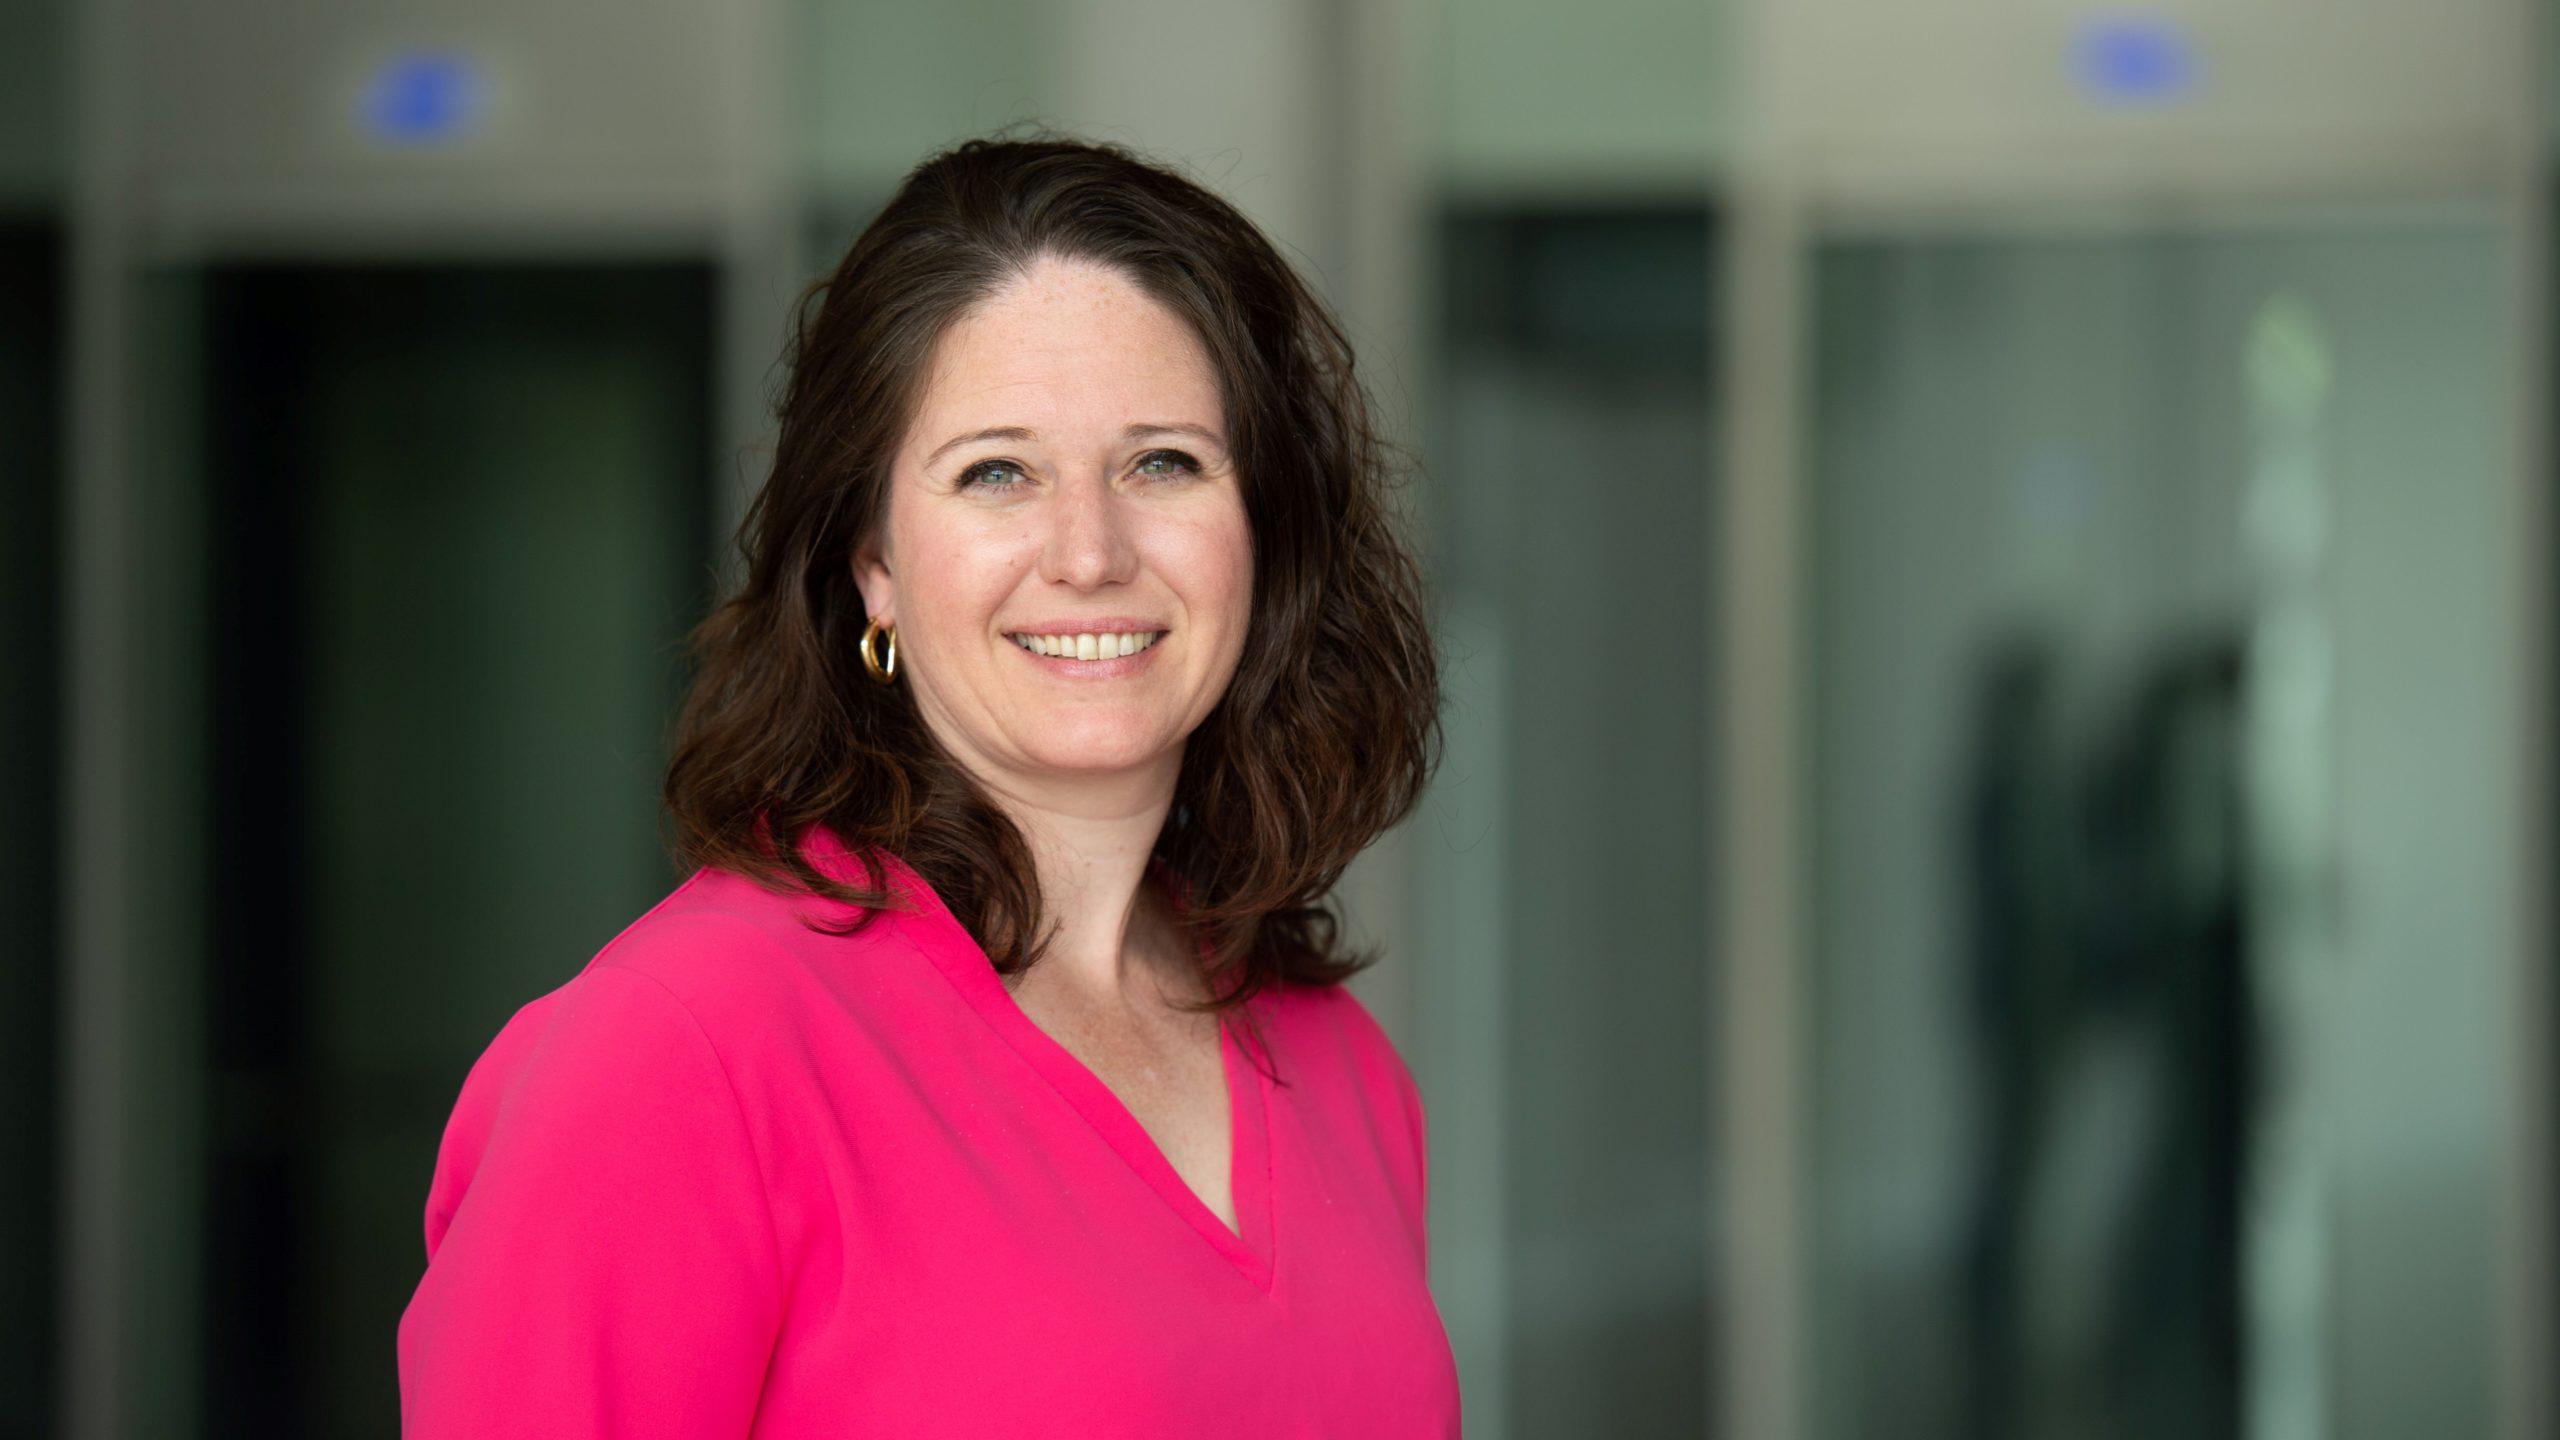 Sonja Konrad, MBA IHM Class of 2019